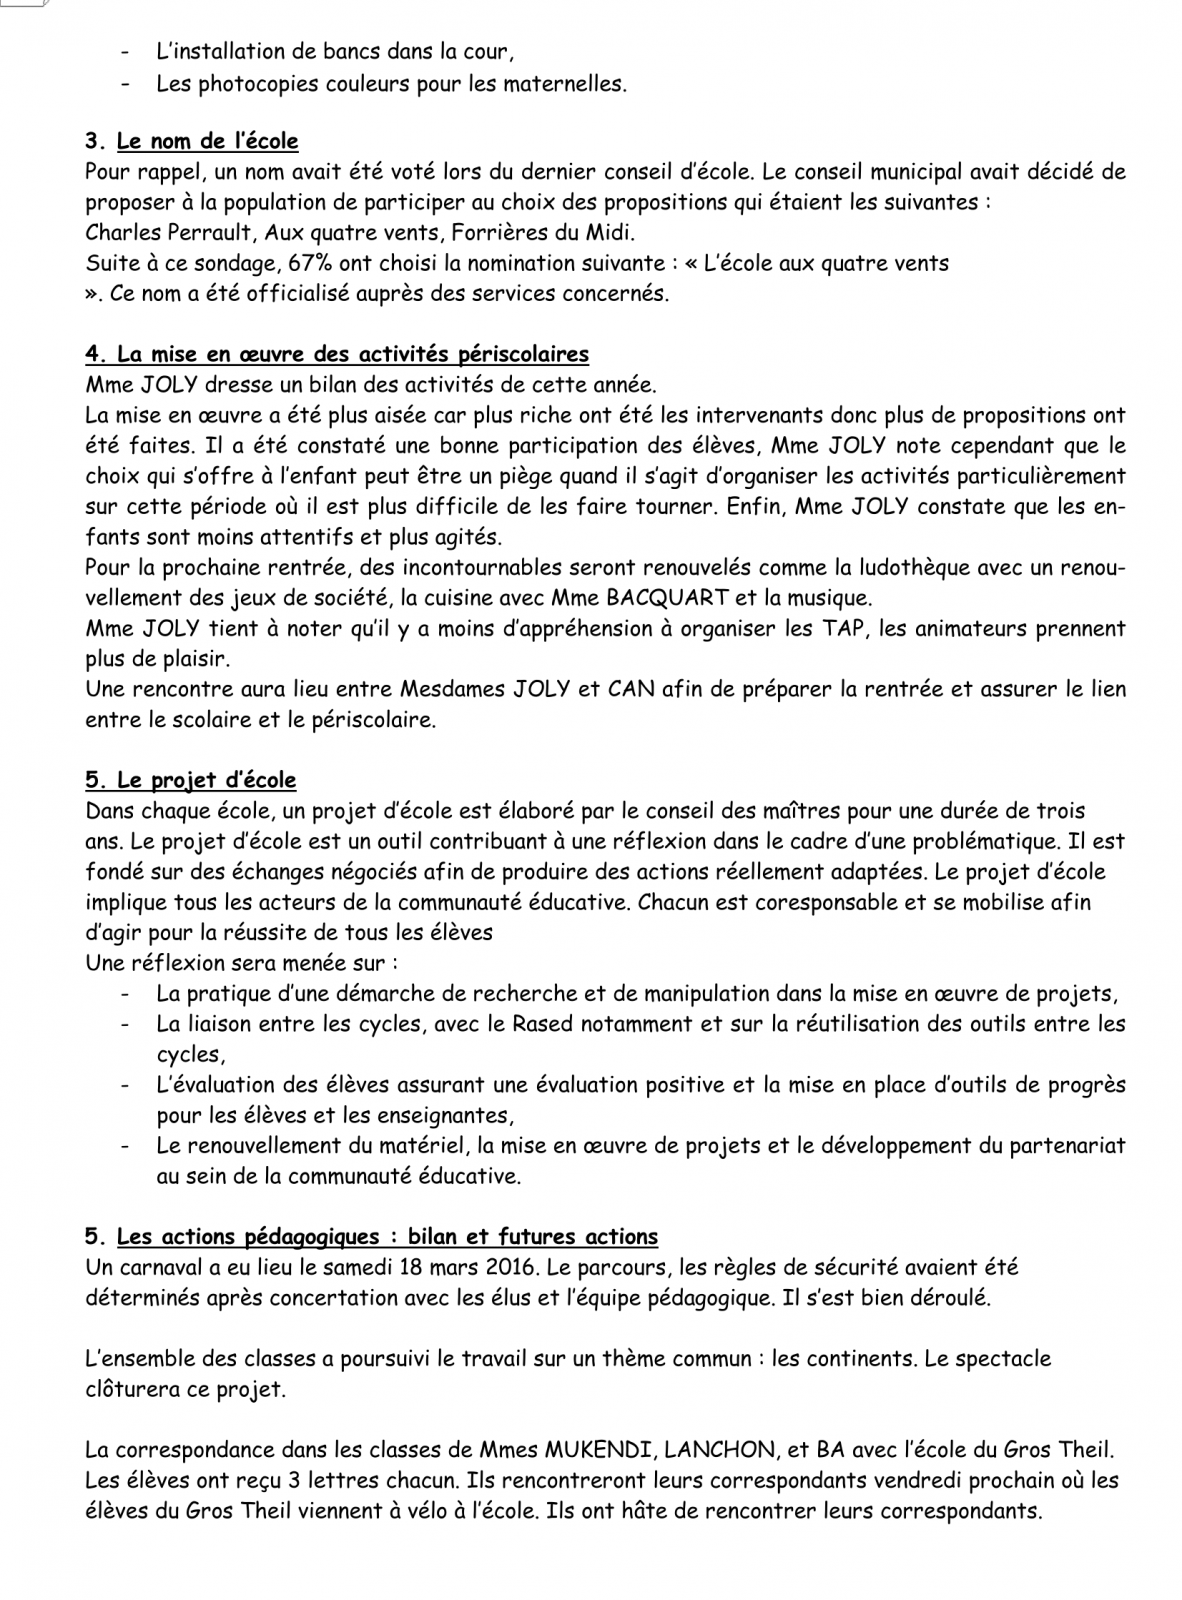 pv-conseil-dcole-3-pdf-modifi-2